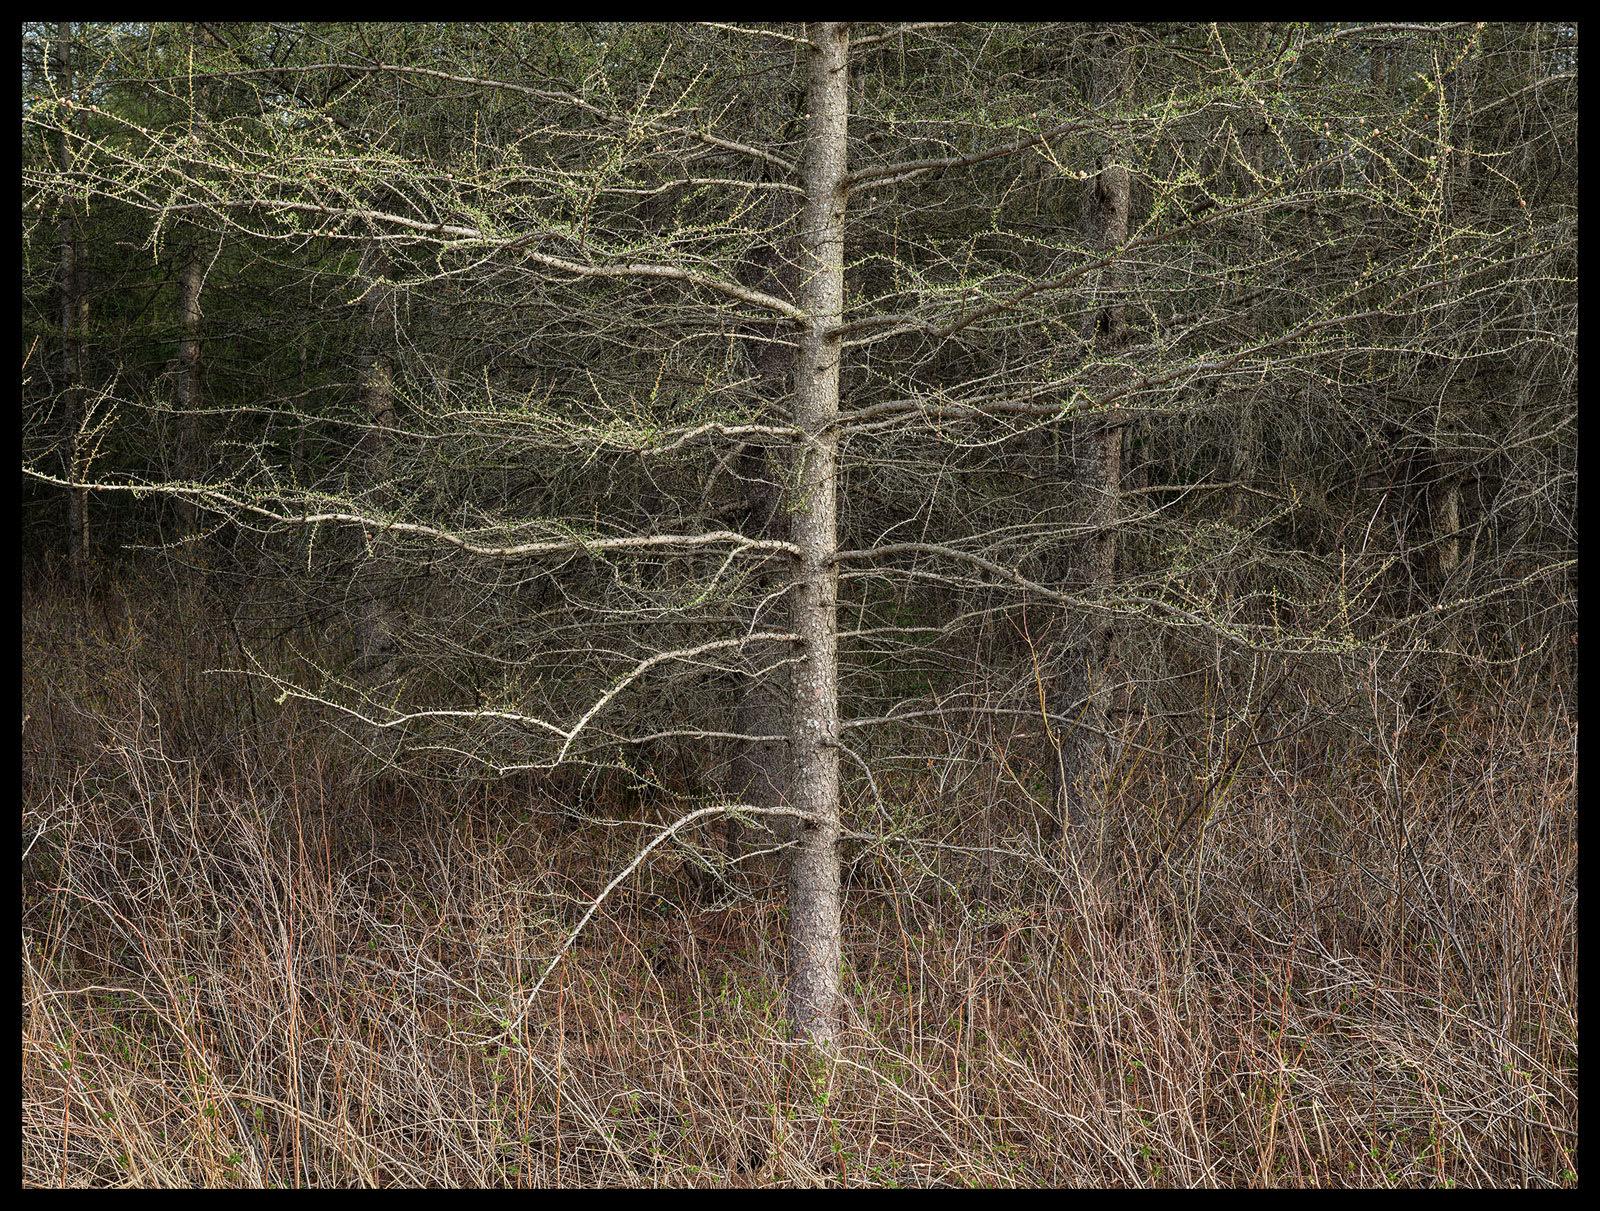 Edward Burtynsky, Natural Order #31, Grey County, Ontario, Canada, Spring, 2020